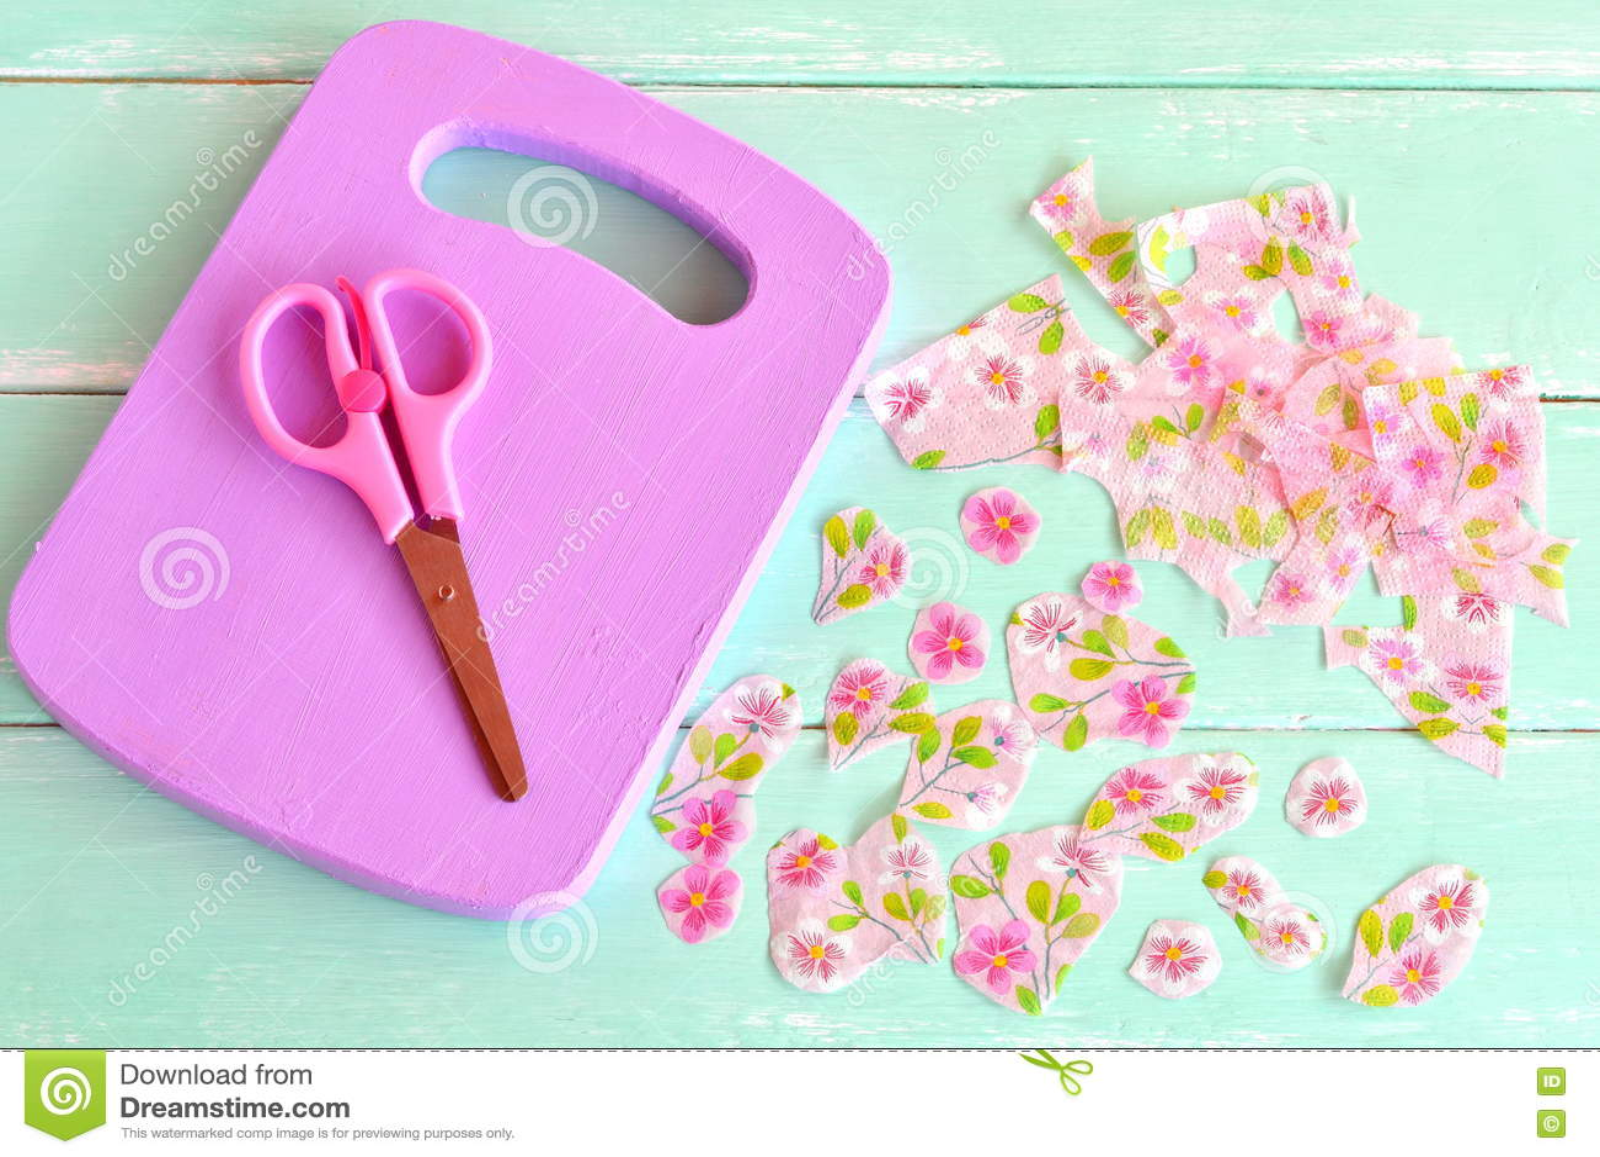 Lilac Wooden Cutting Board Home Made Chopping Board Kitchen Decor